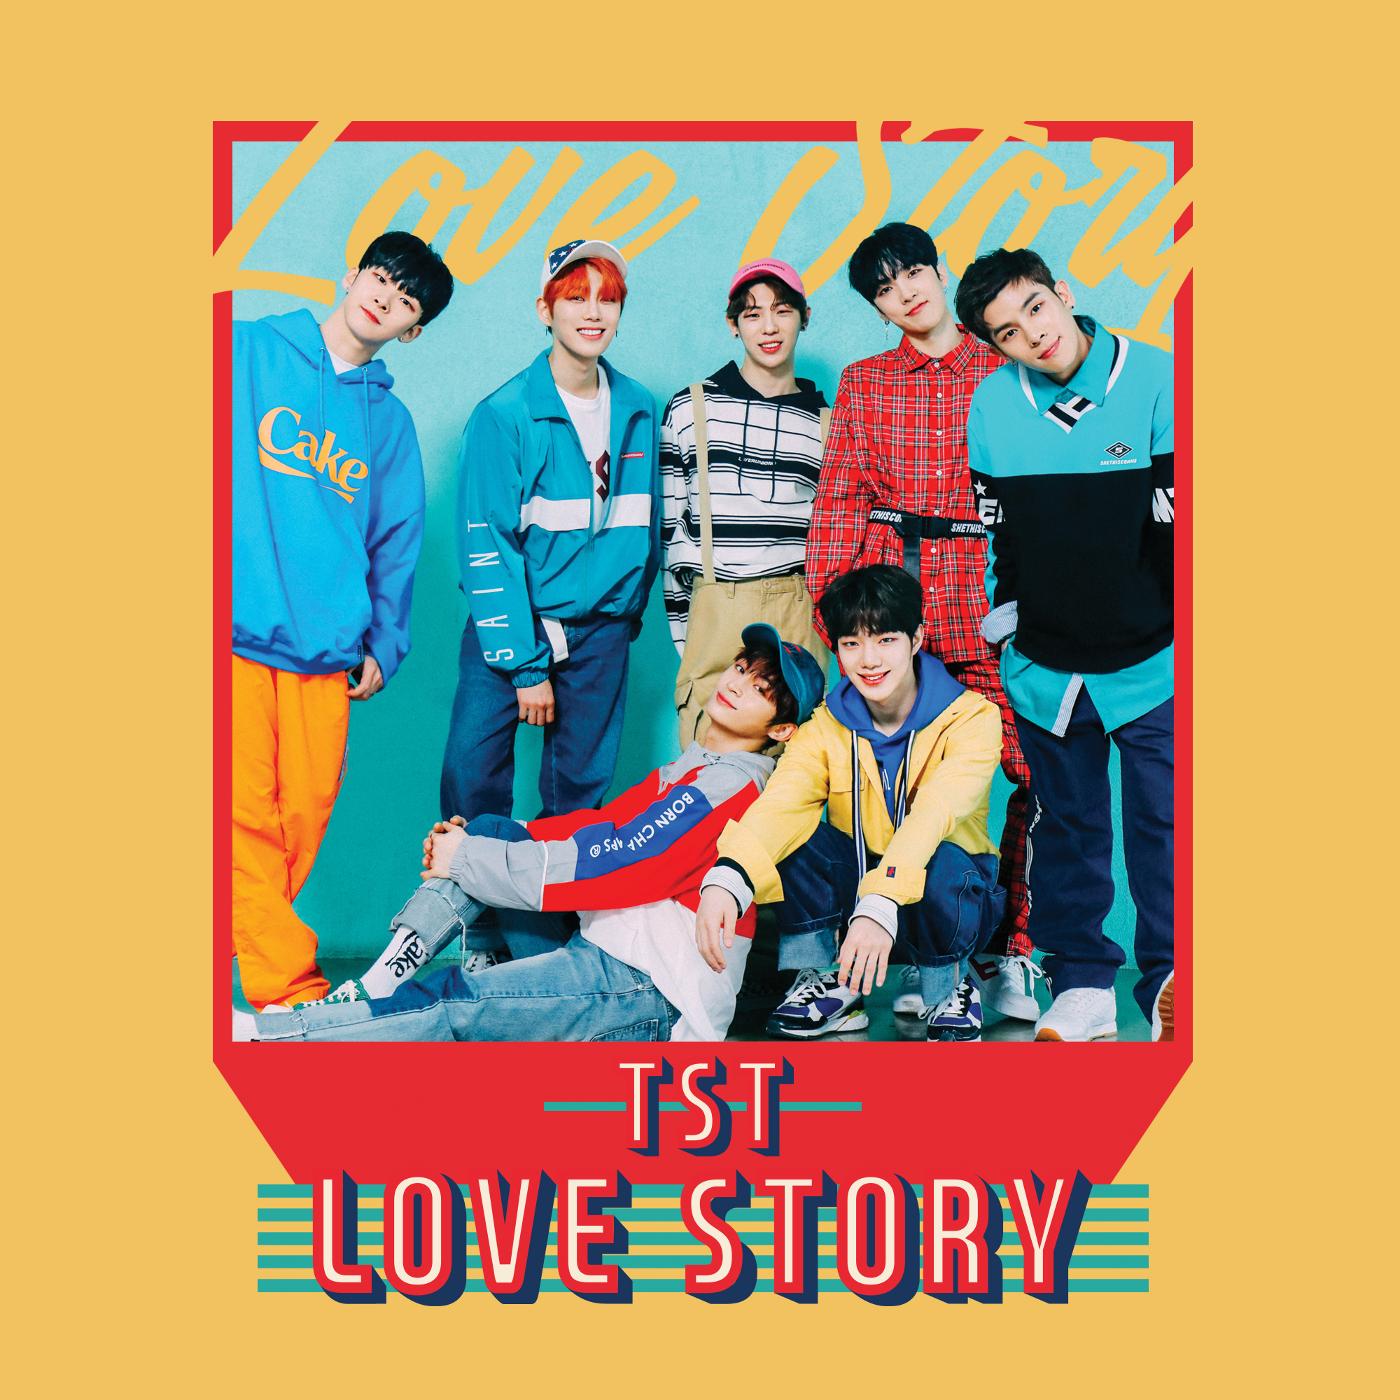 Love Story (TST)